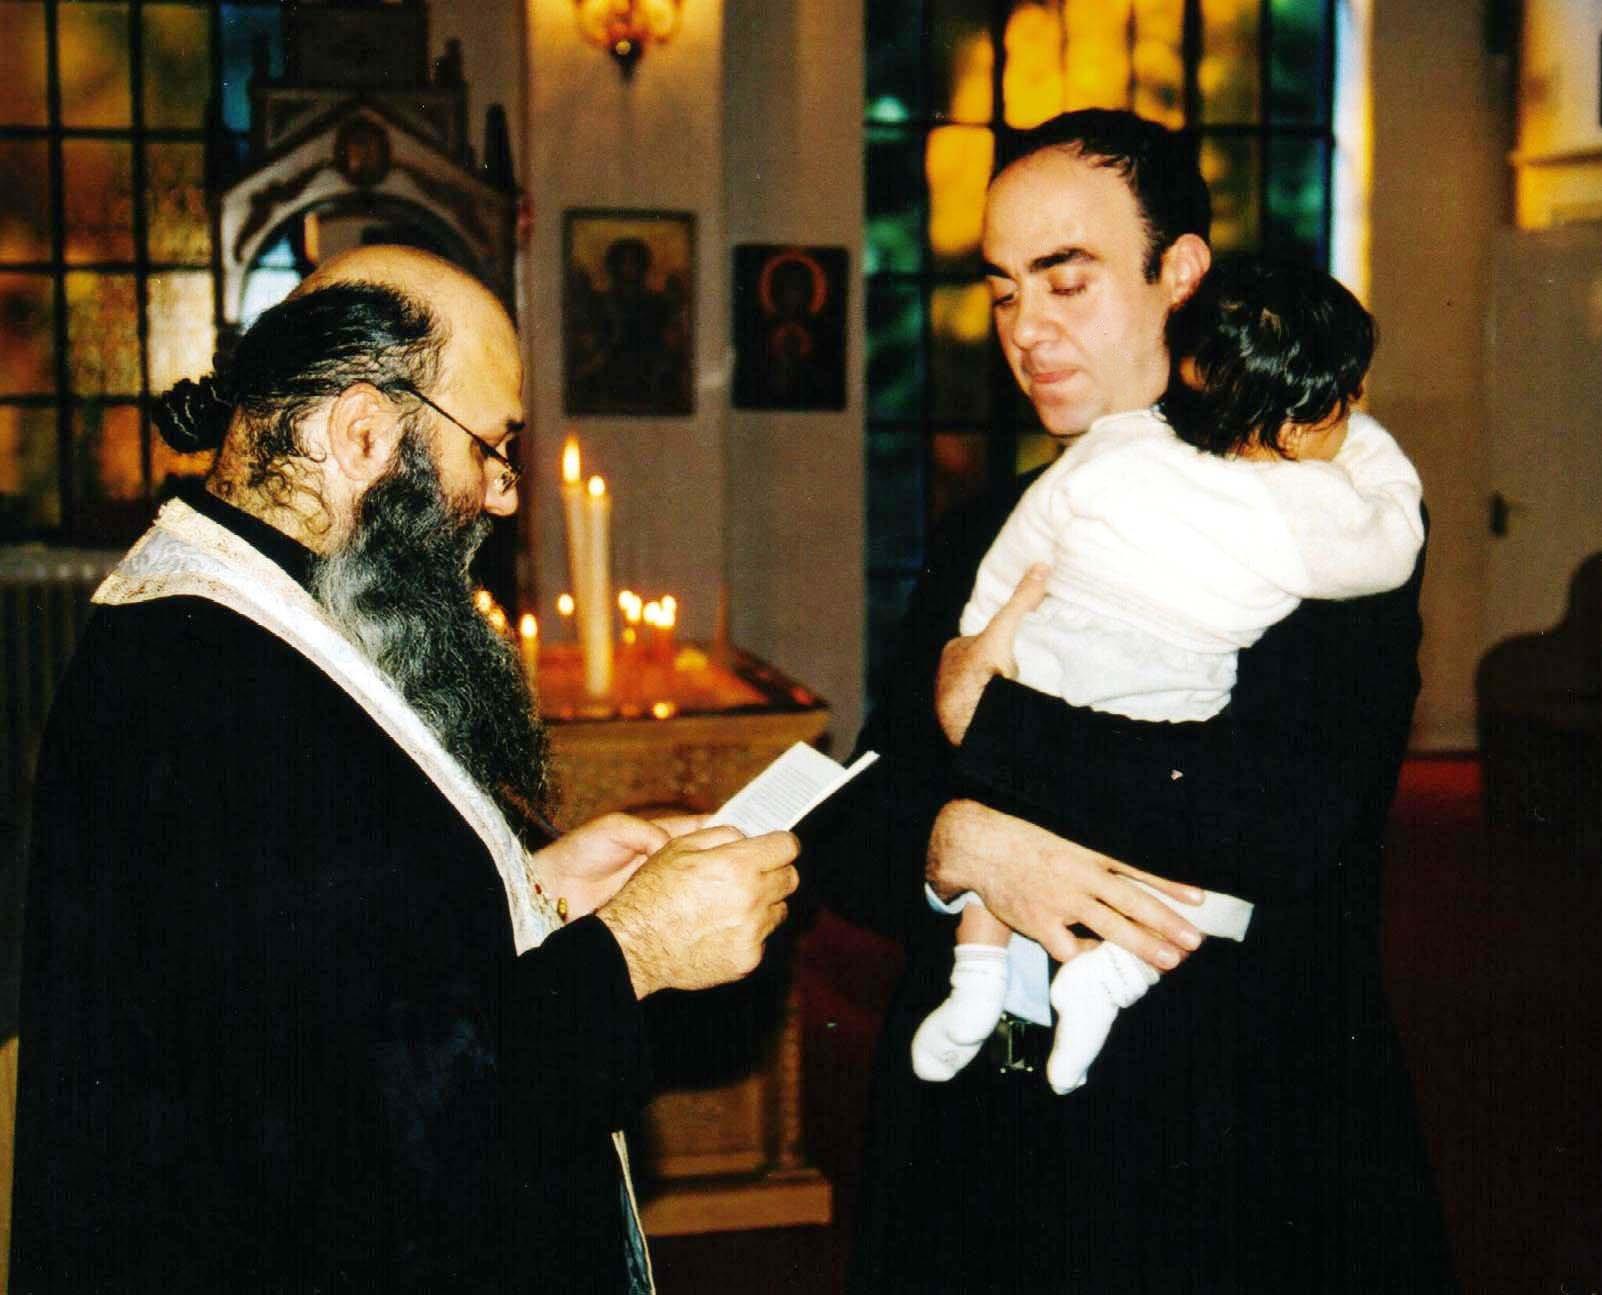 baptism3_lg.jpg